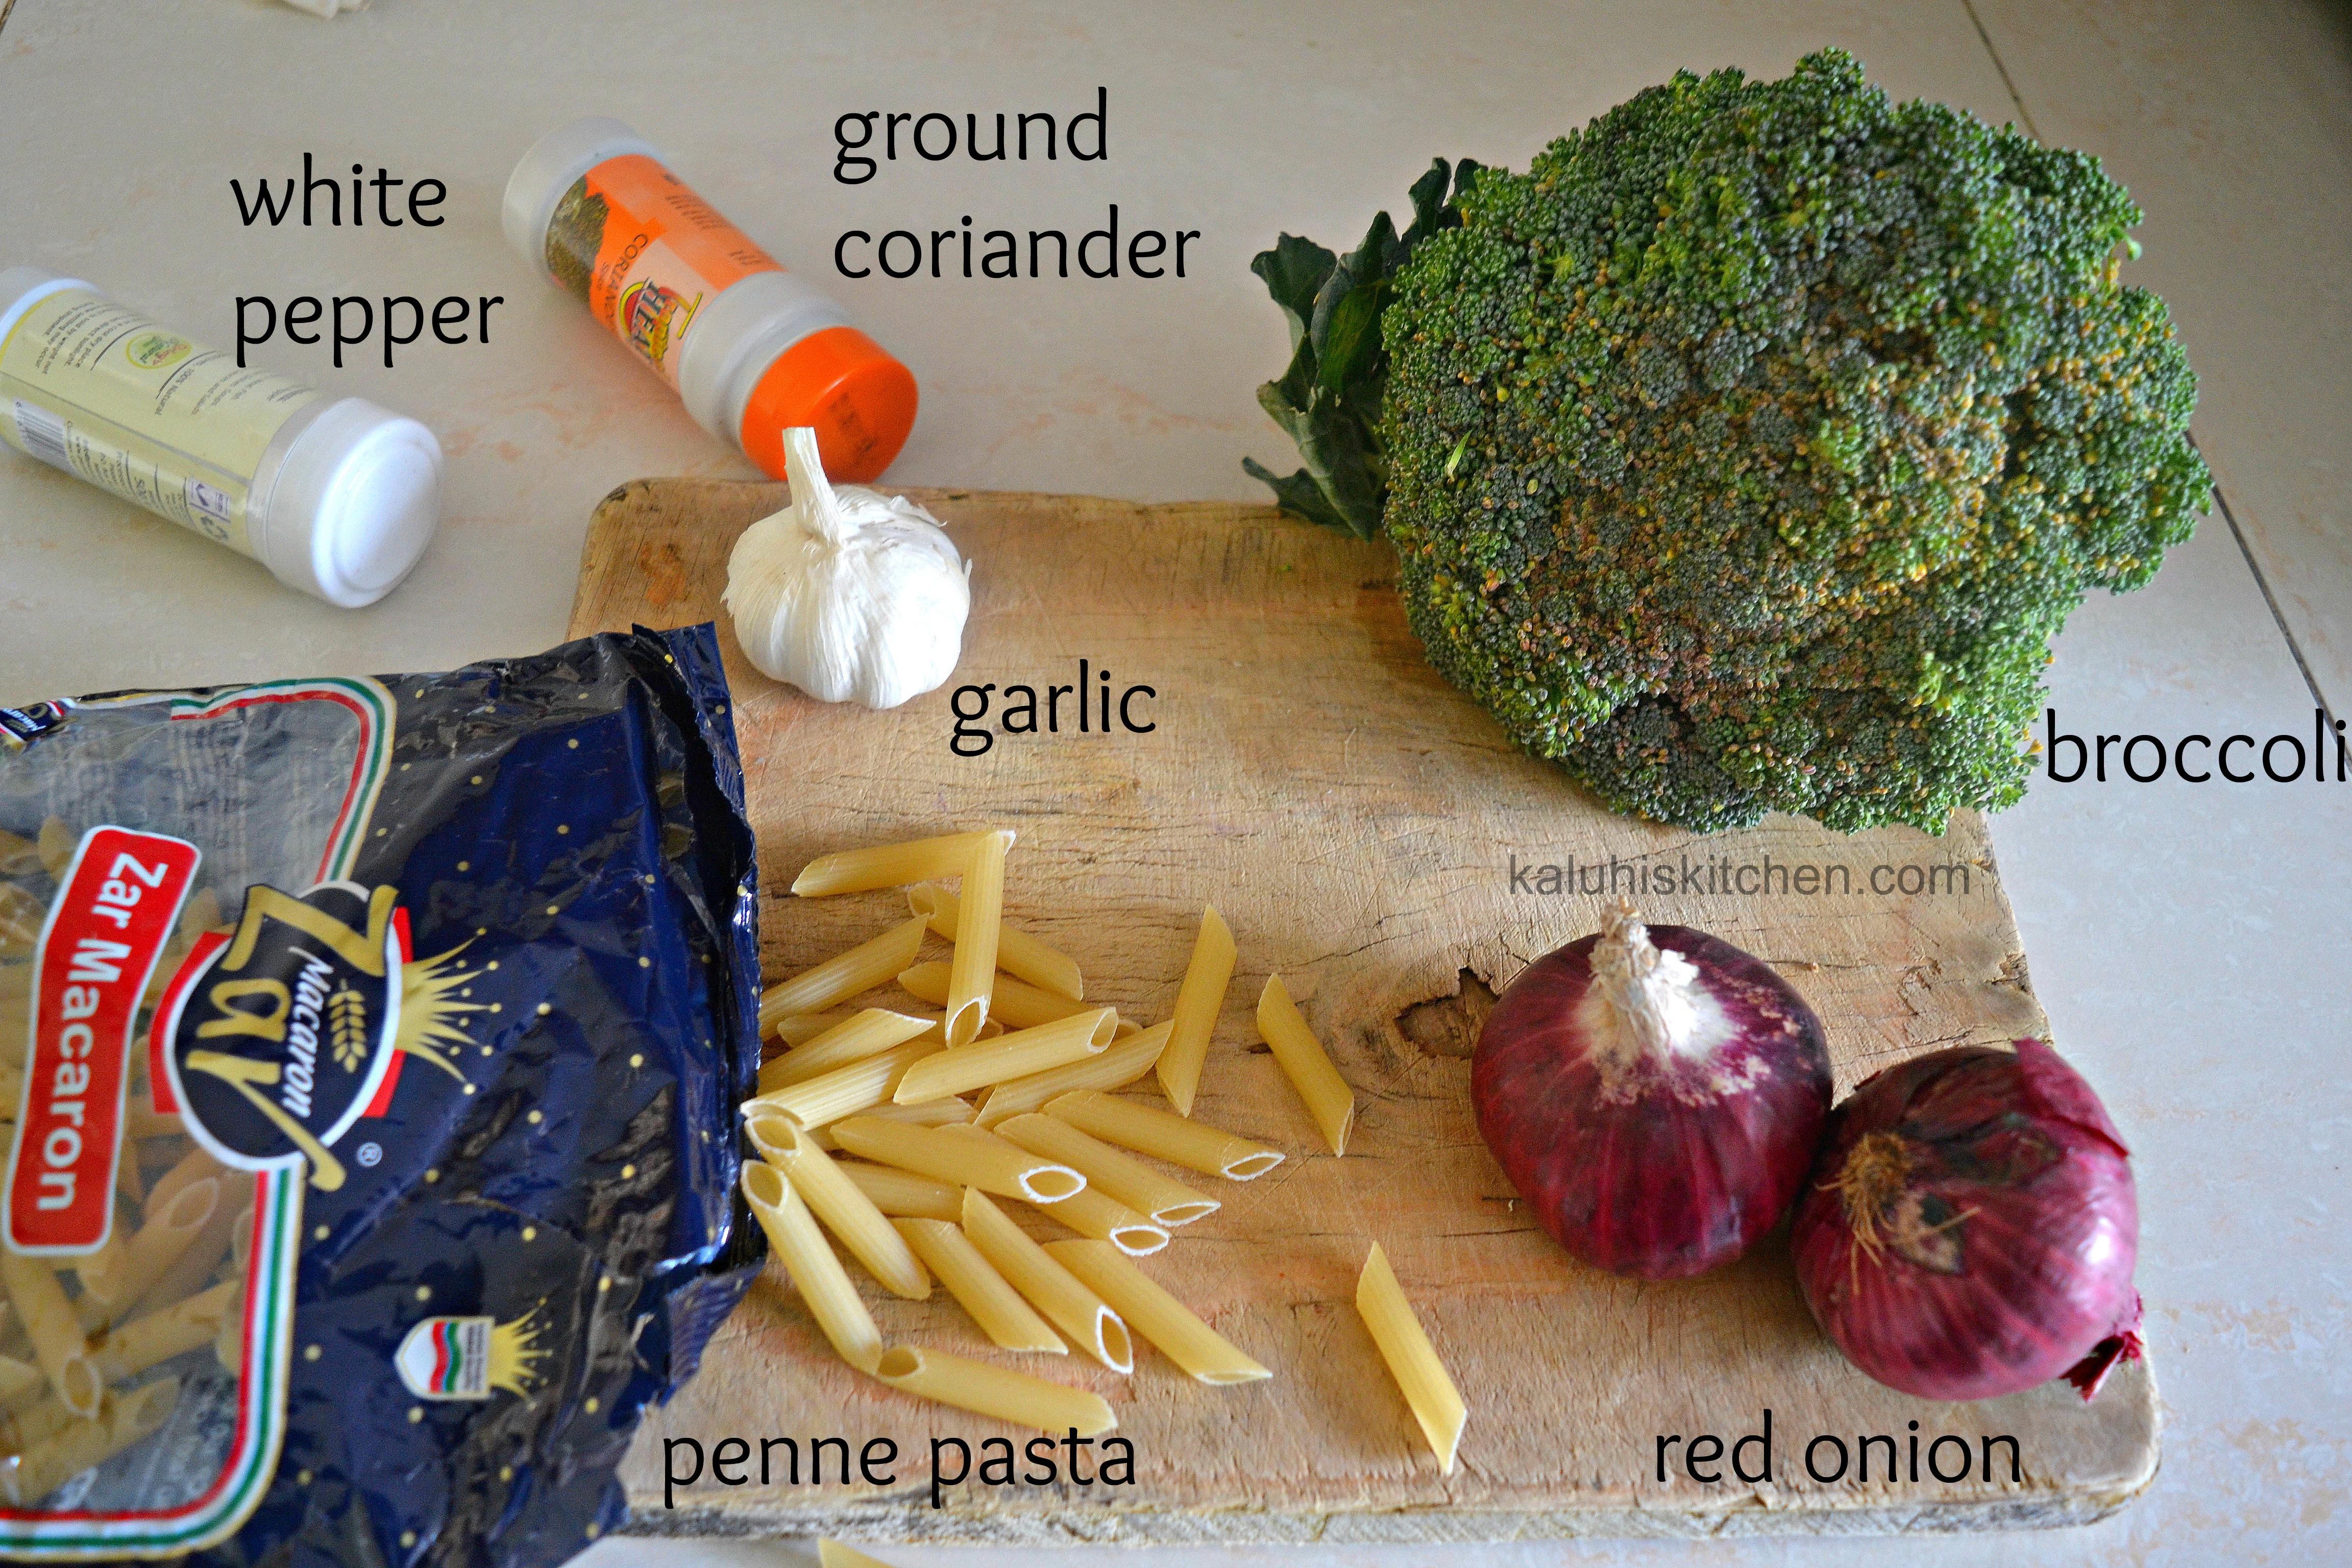 ... penne stir fry_ingredients fro a pasta stir fry_kaluhiskitchen.com